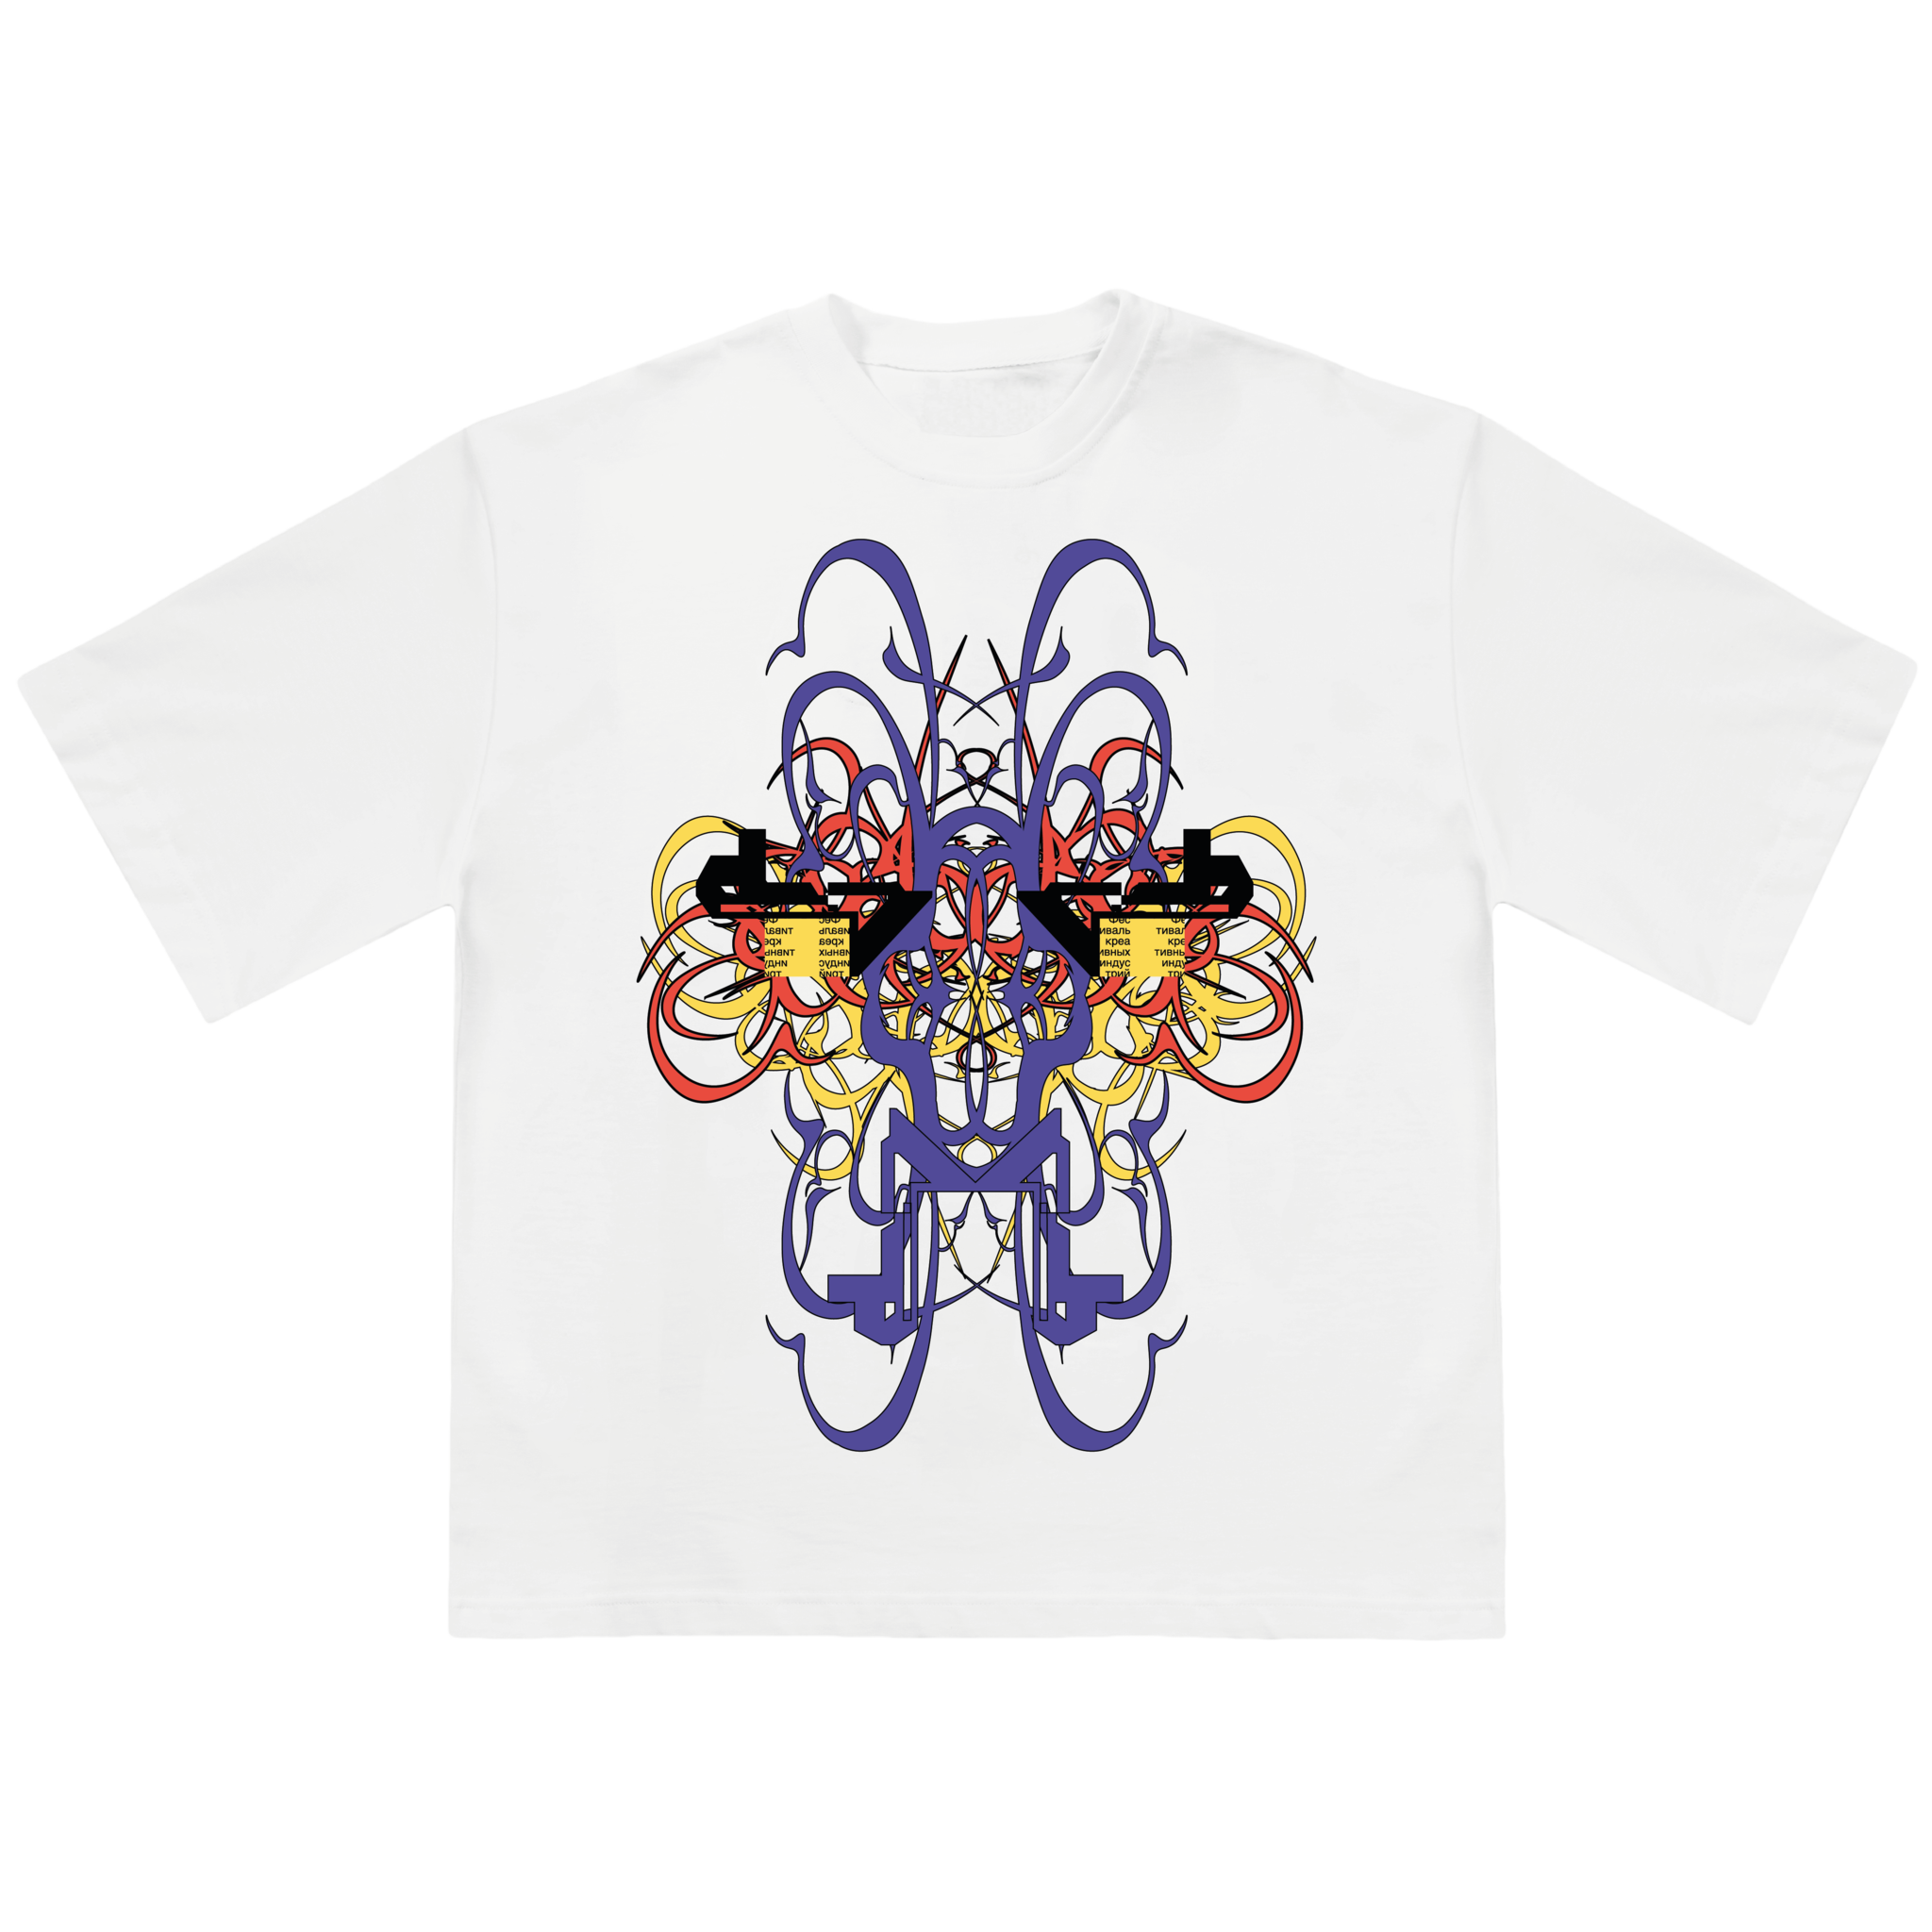 smart oversize футболка G8 & Щёлочь ALIEN